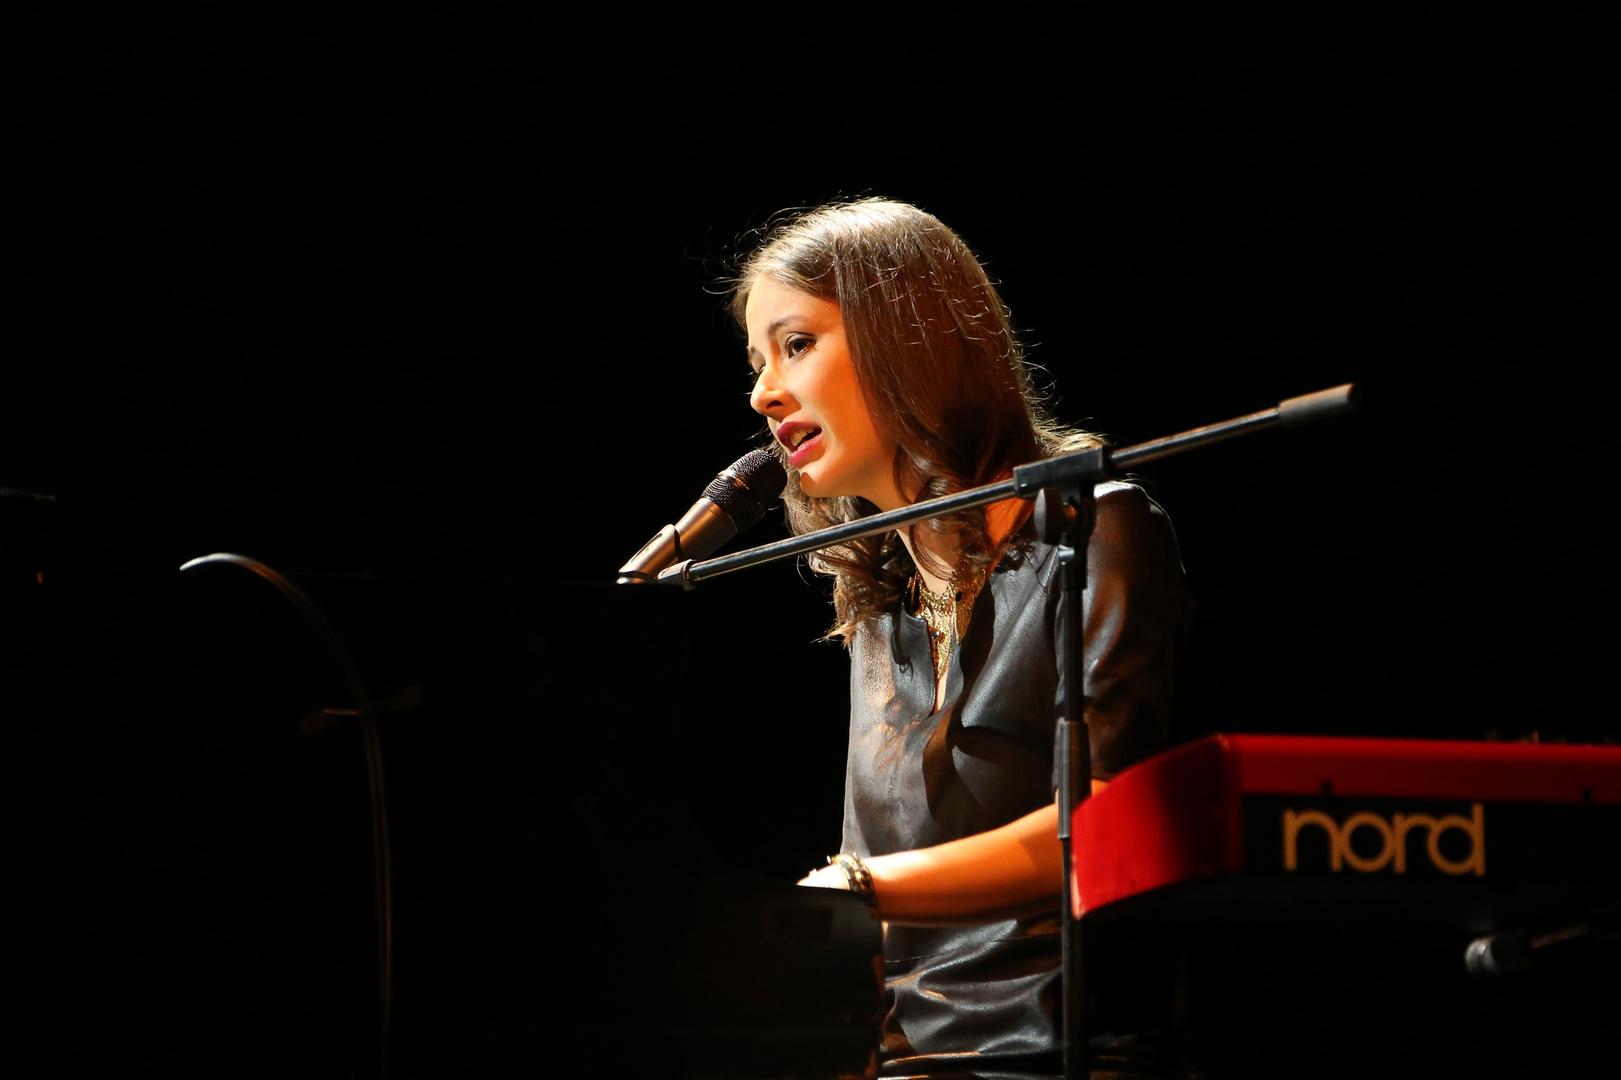 Céline Huber